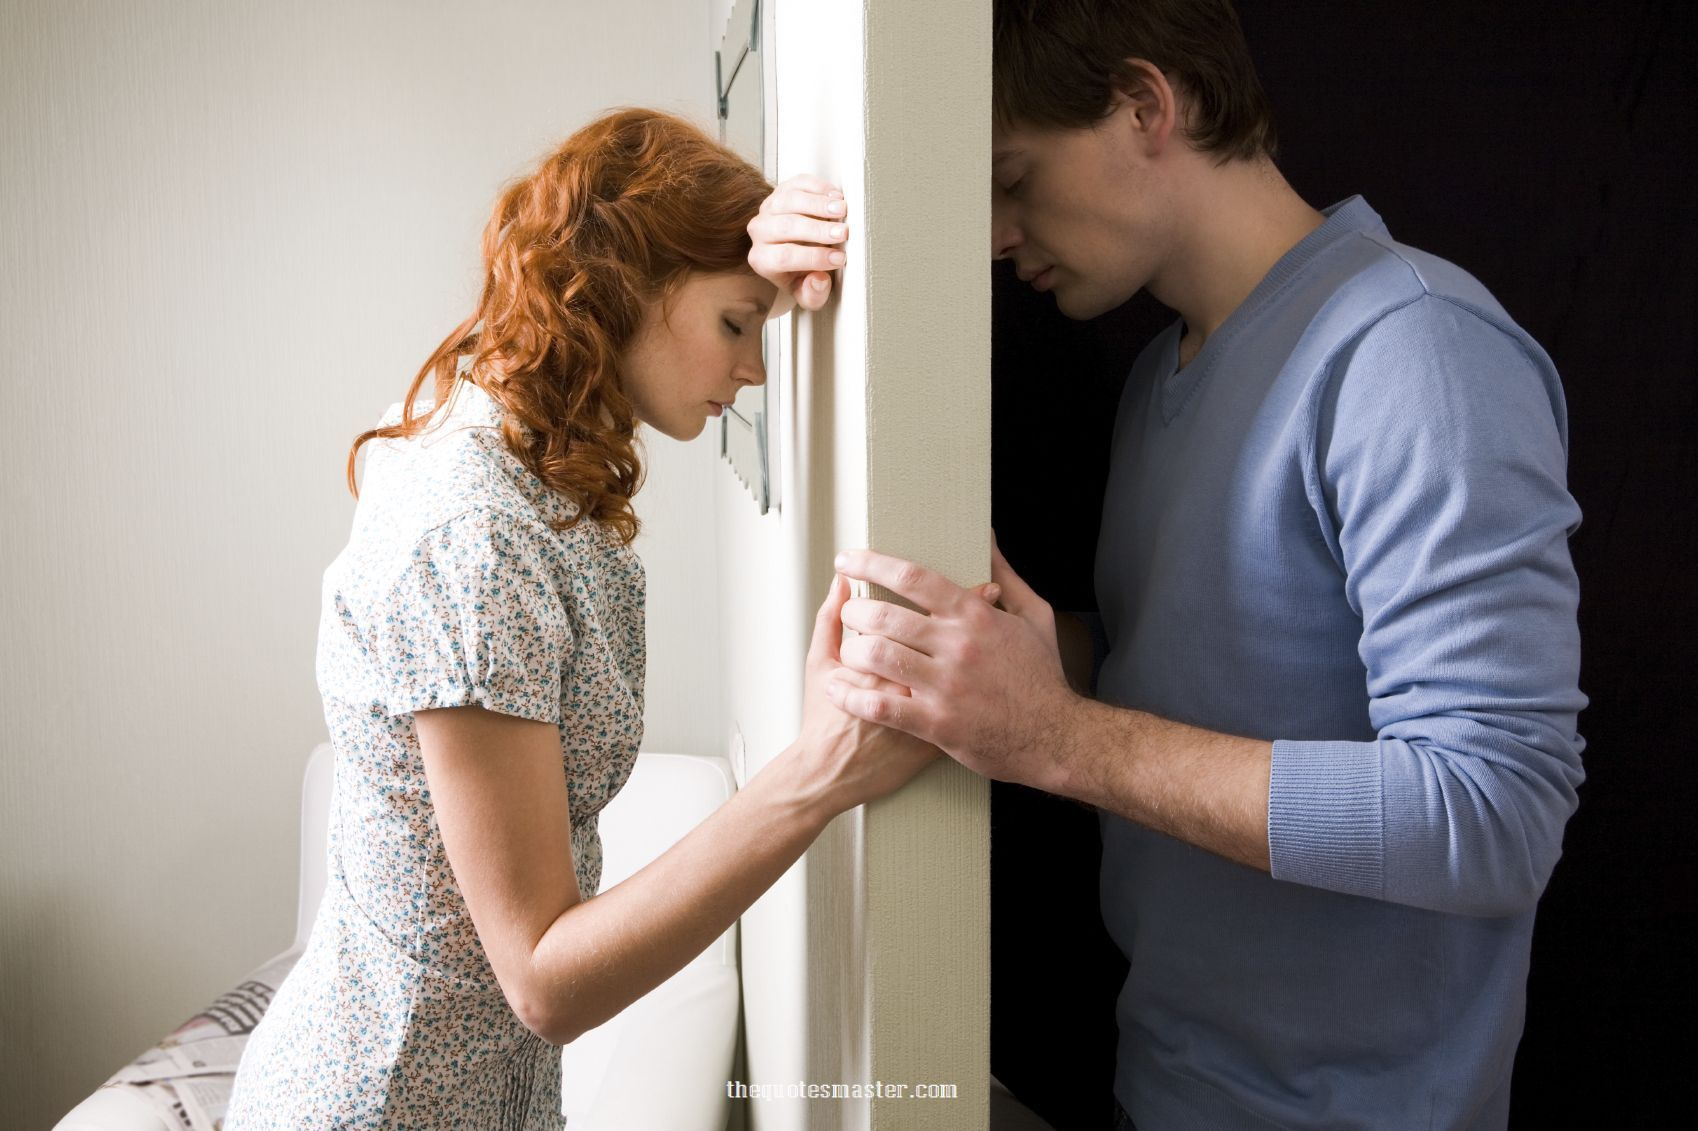 Bagaimana Cara Memaafkan Seseorang yang Telah Menyelingkuhi Kita?